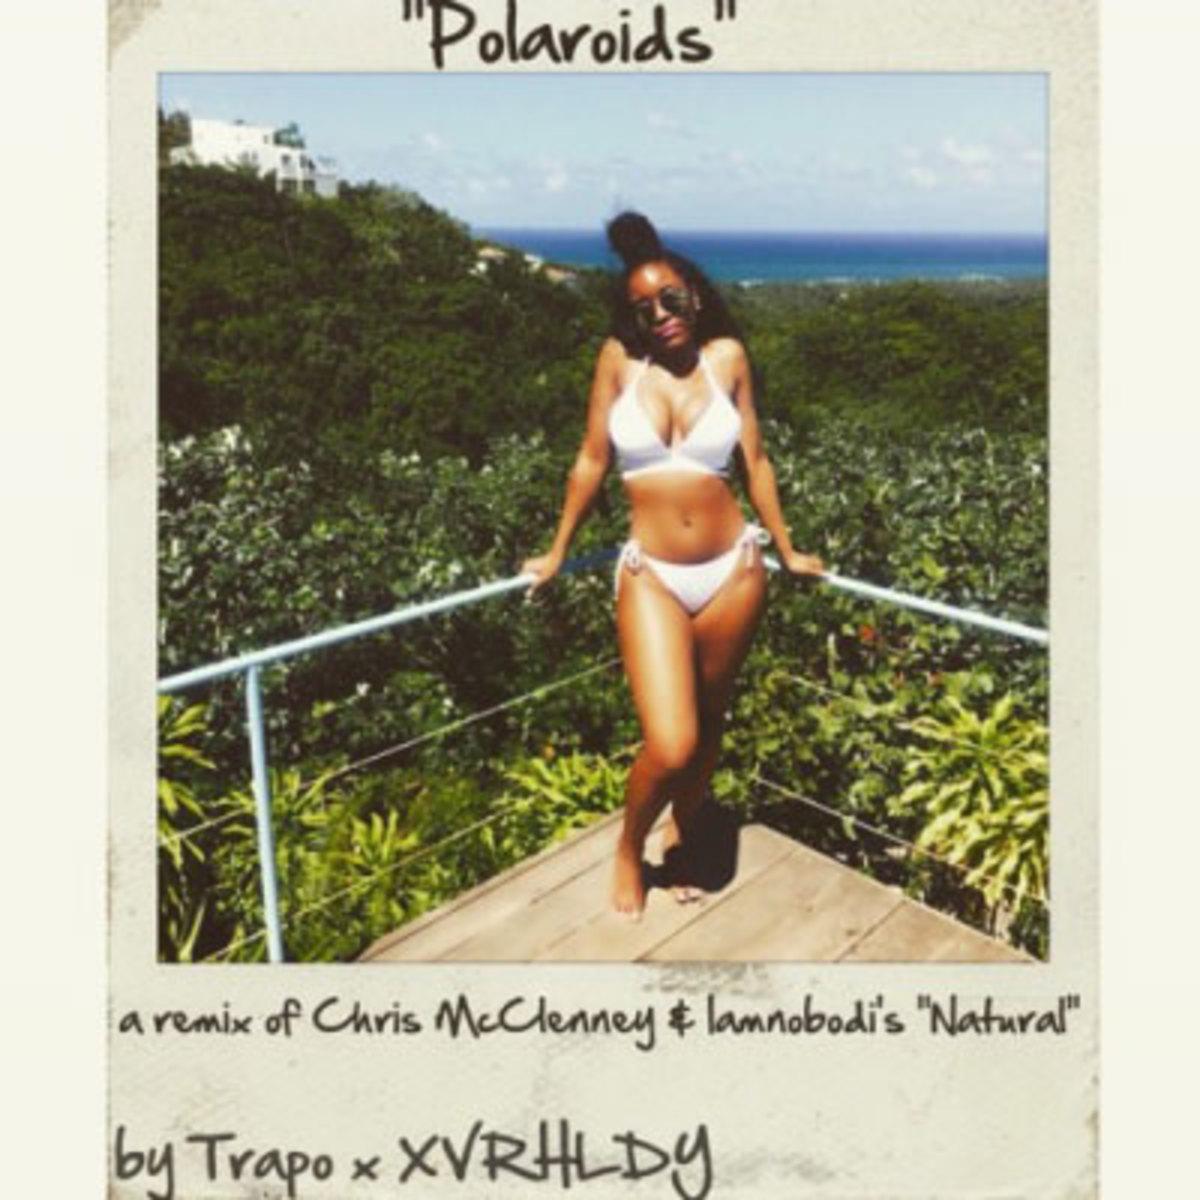 polaroids-xvrhldy-trapo.jpg